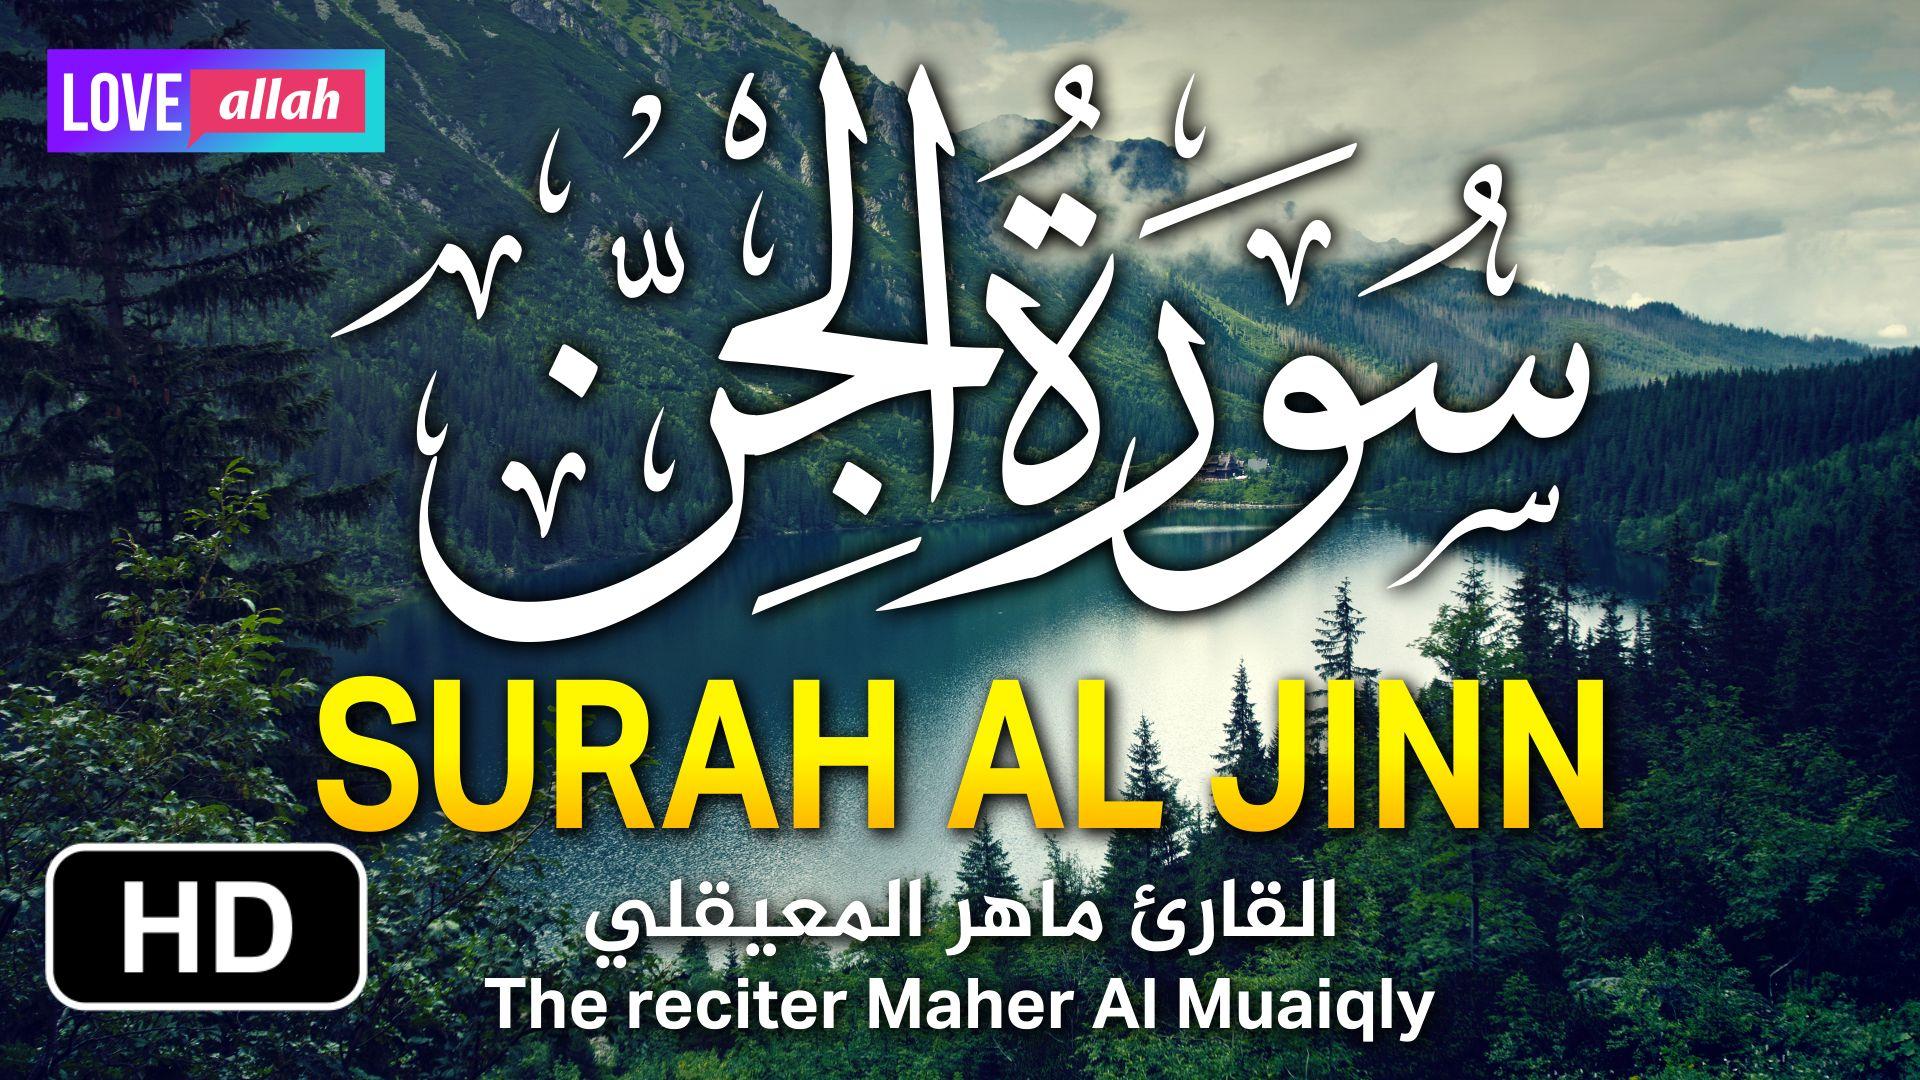 Quran Karim I سورة الجن كاملة تلاوة تملأ قلبك بالاطمئنان والهدوء القارئ ماهر المعيقلي Quran Surah Quran Islam